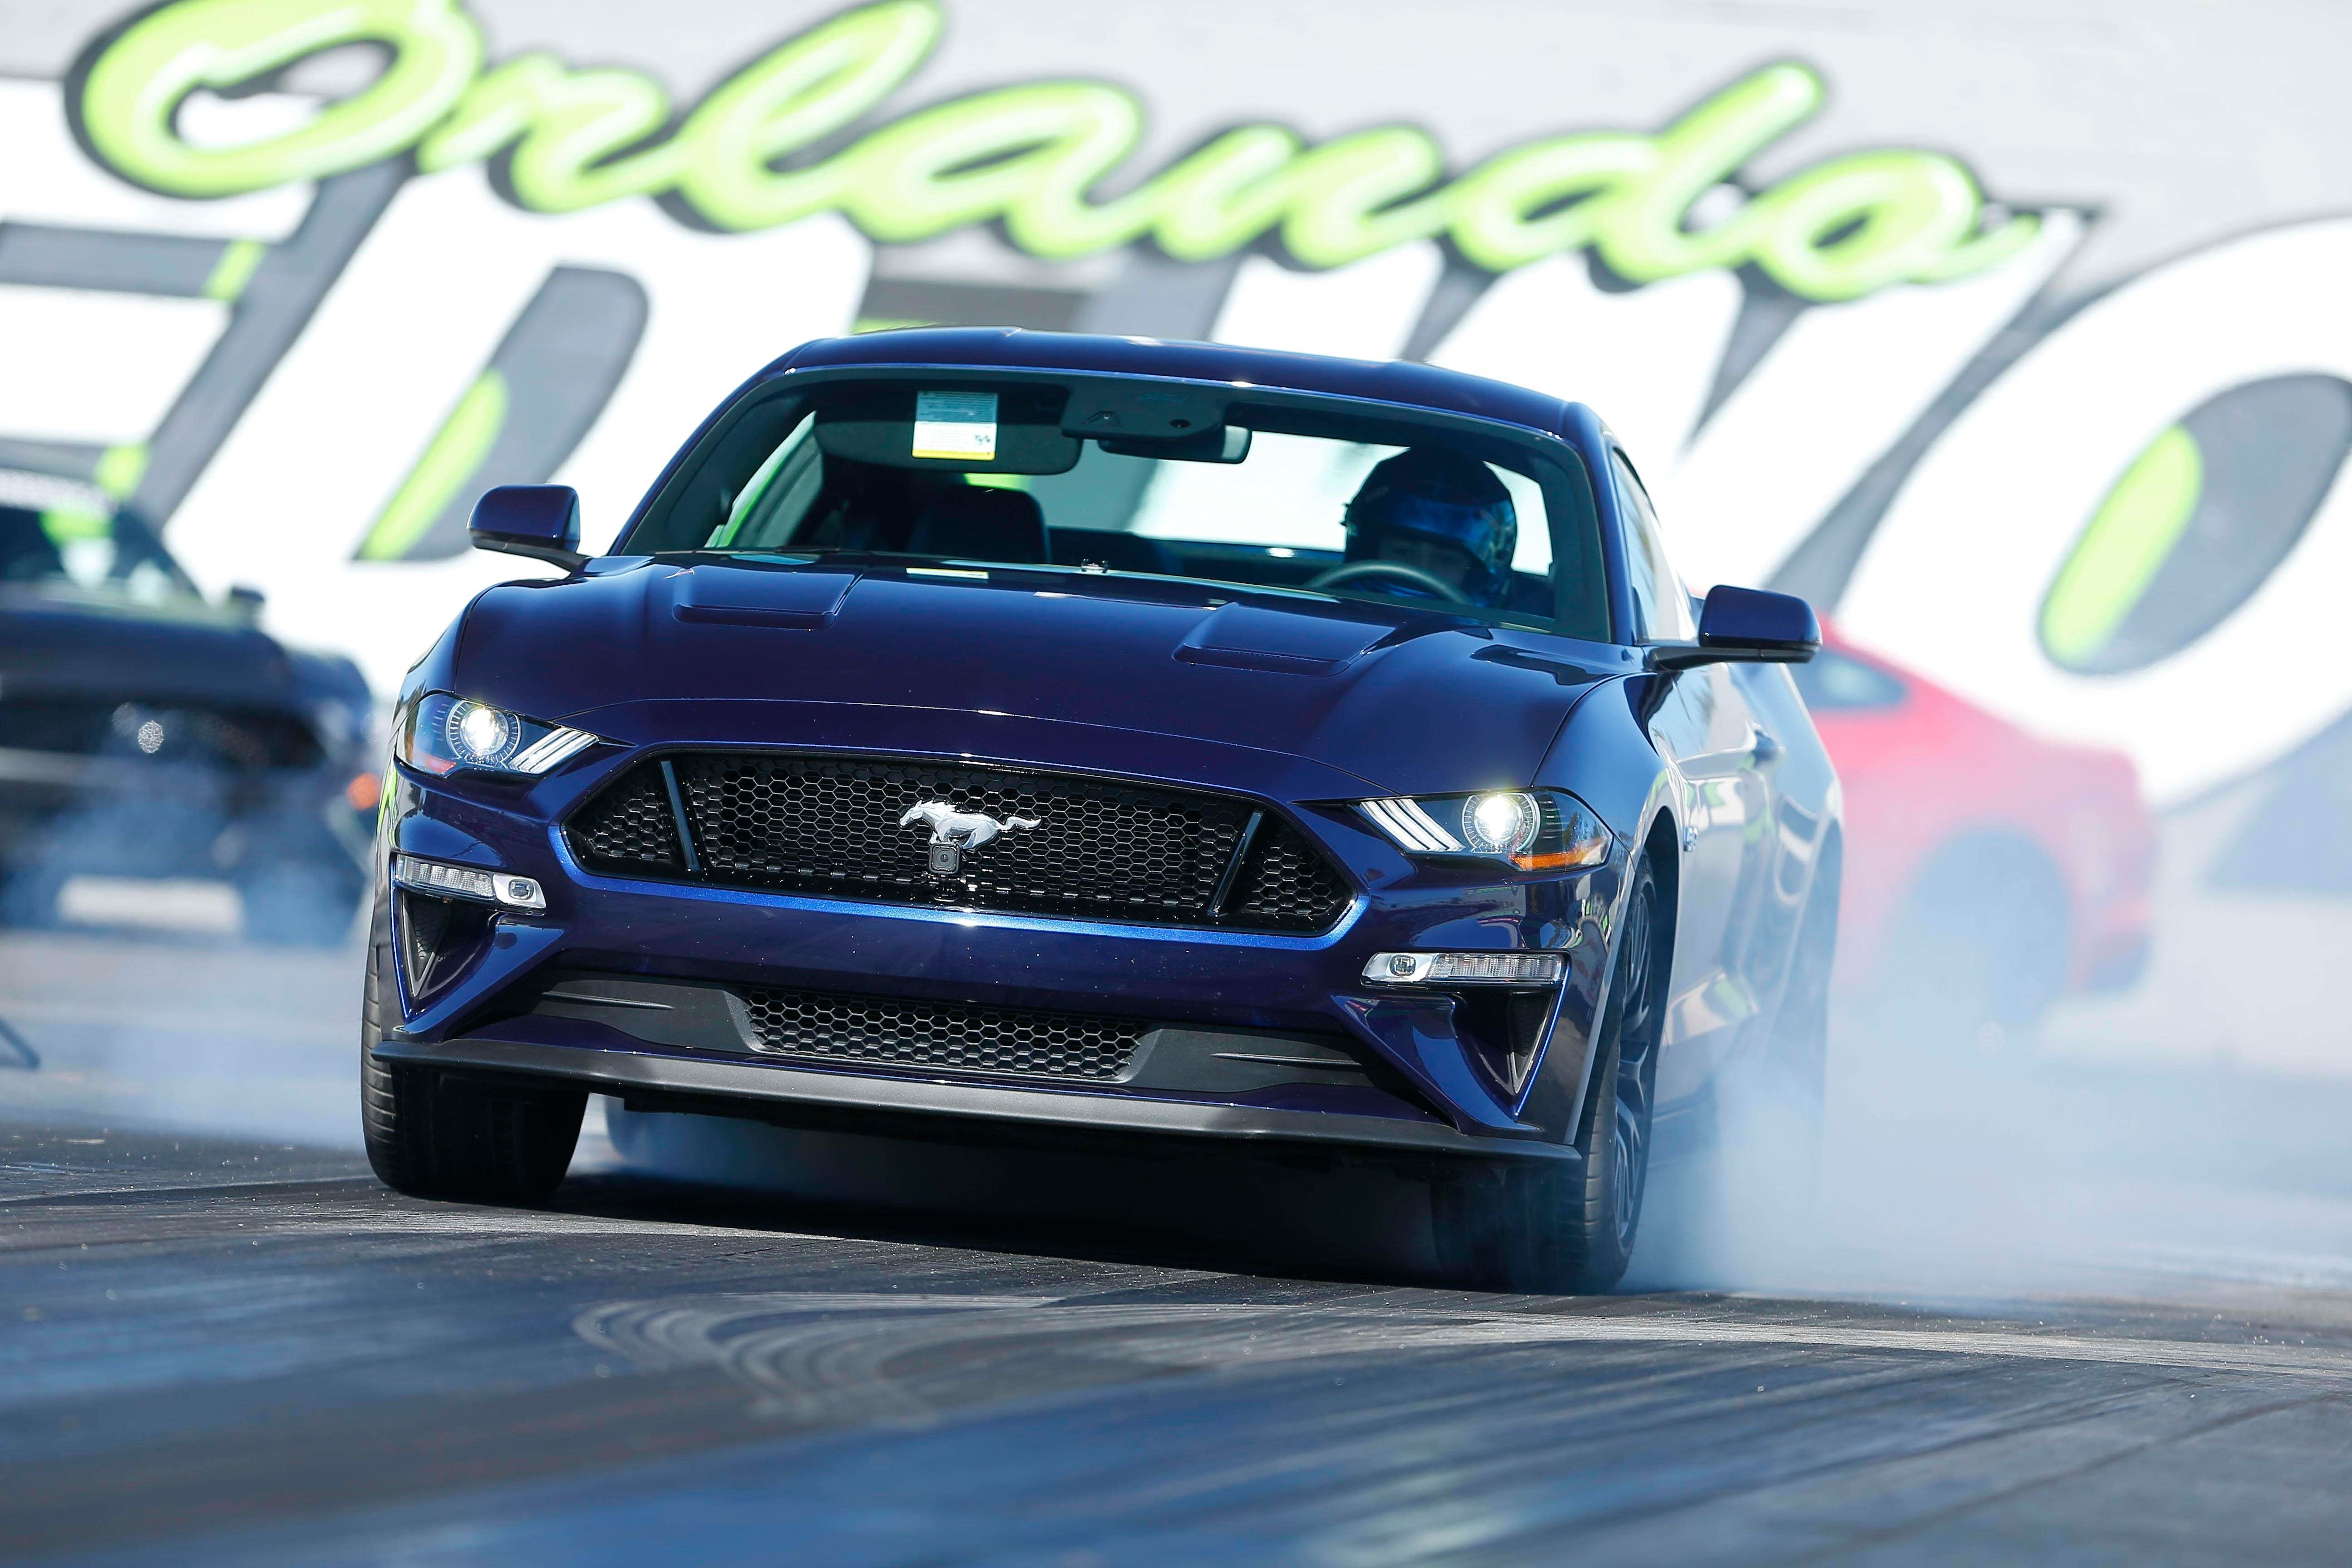 Bone Stock 2018 Mustang Gt Automatic Runs 11 83 119 51 Mph